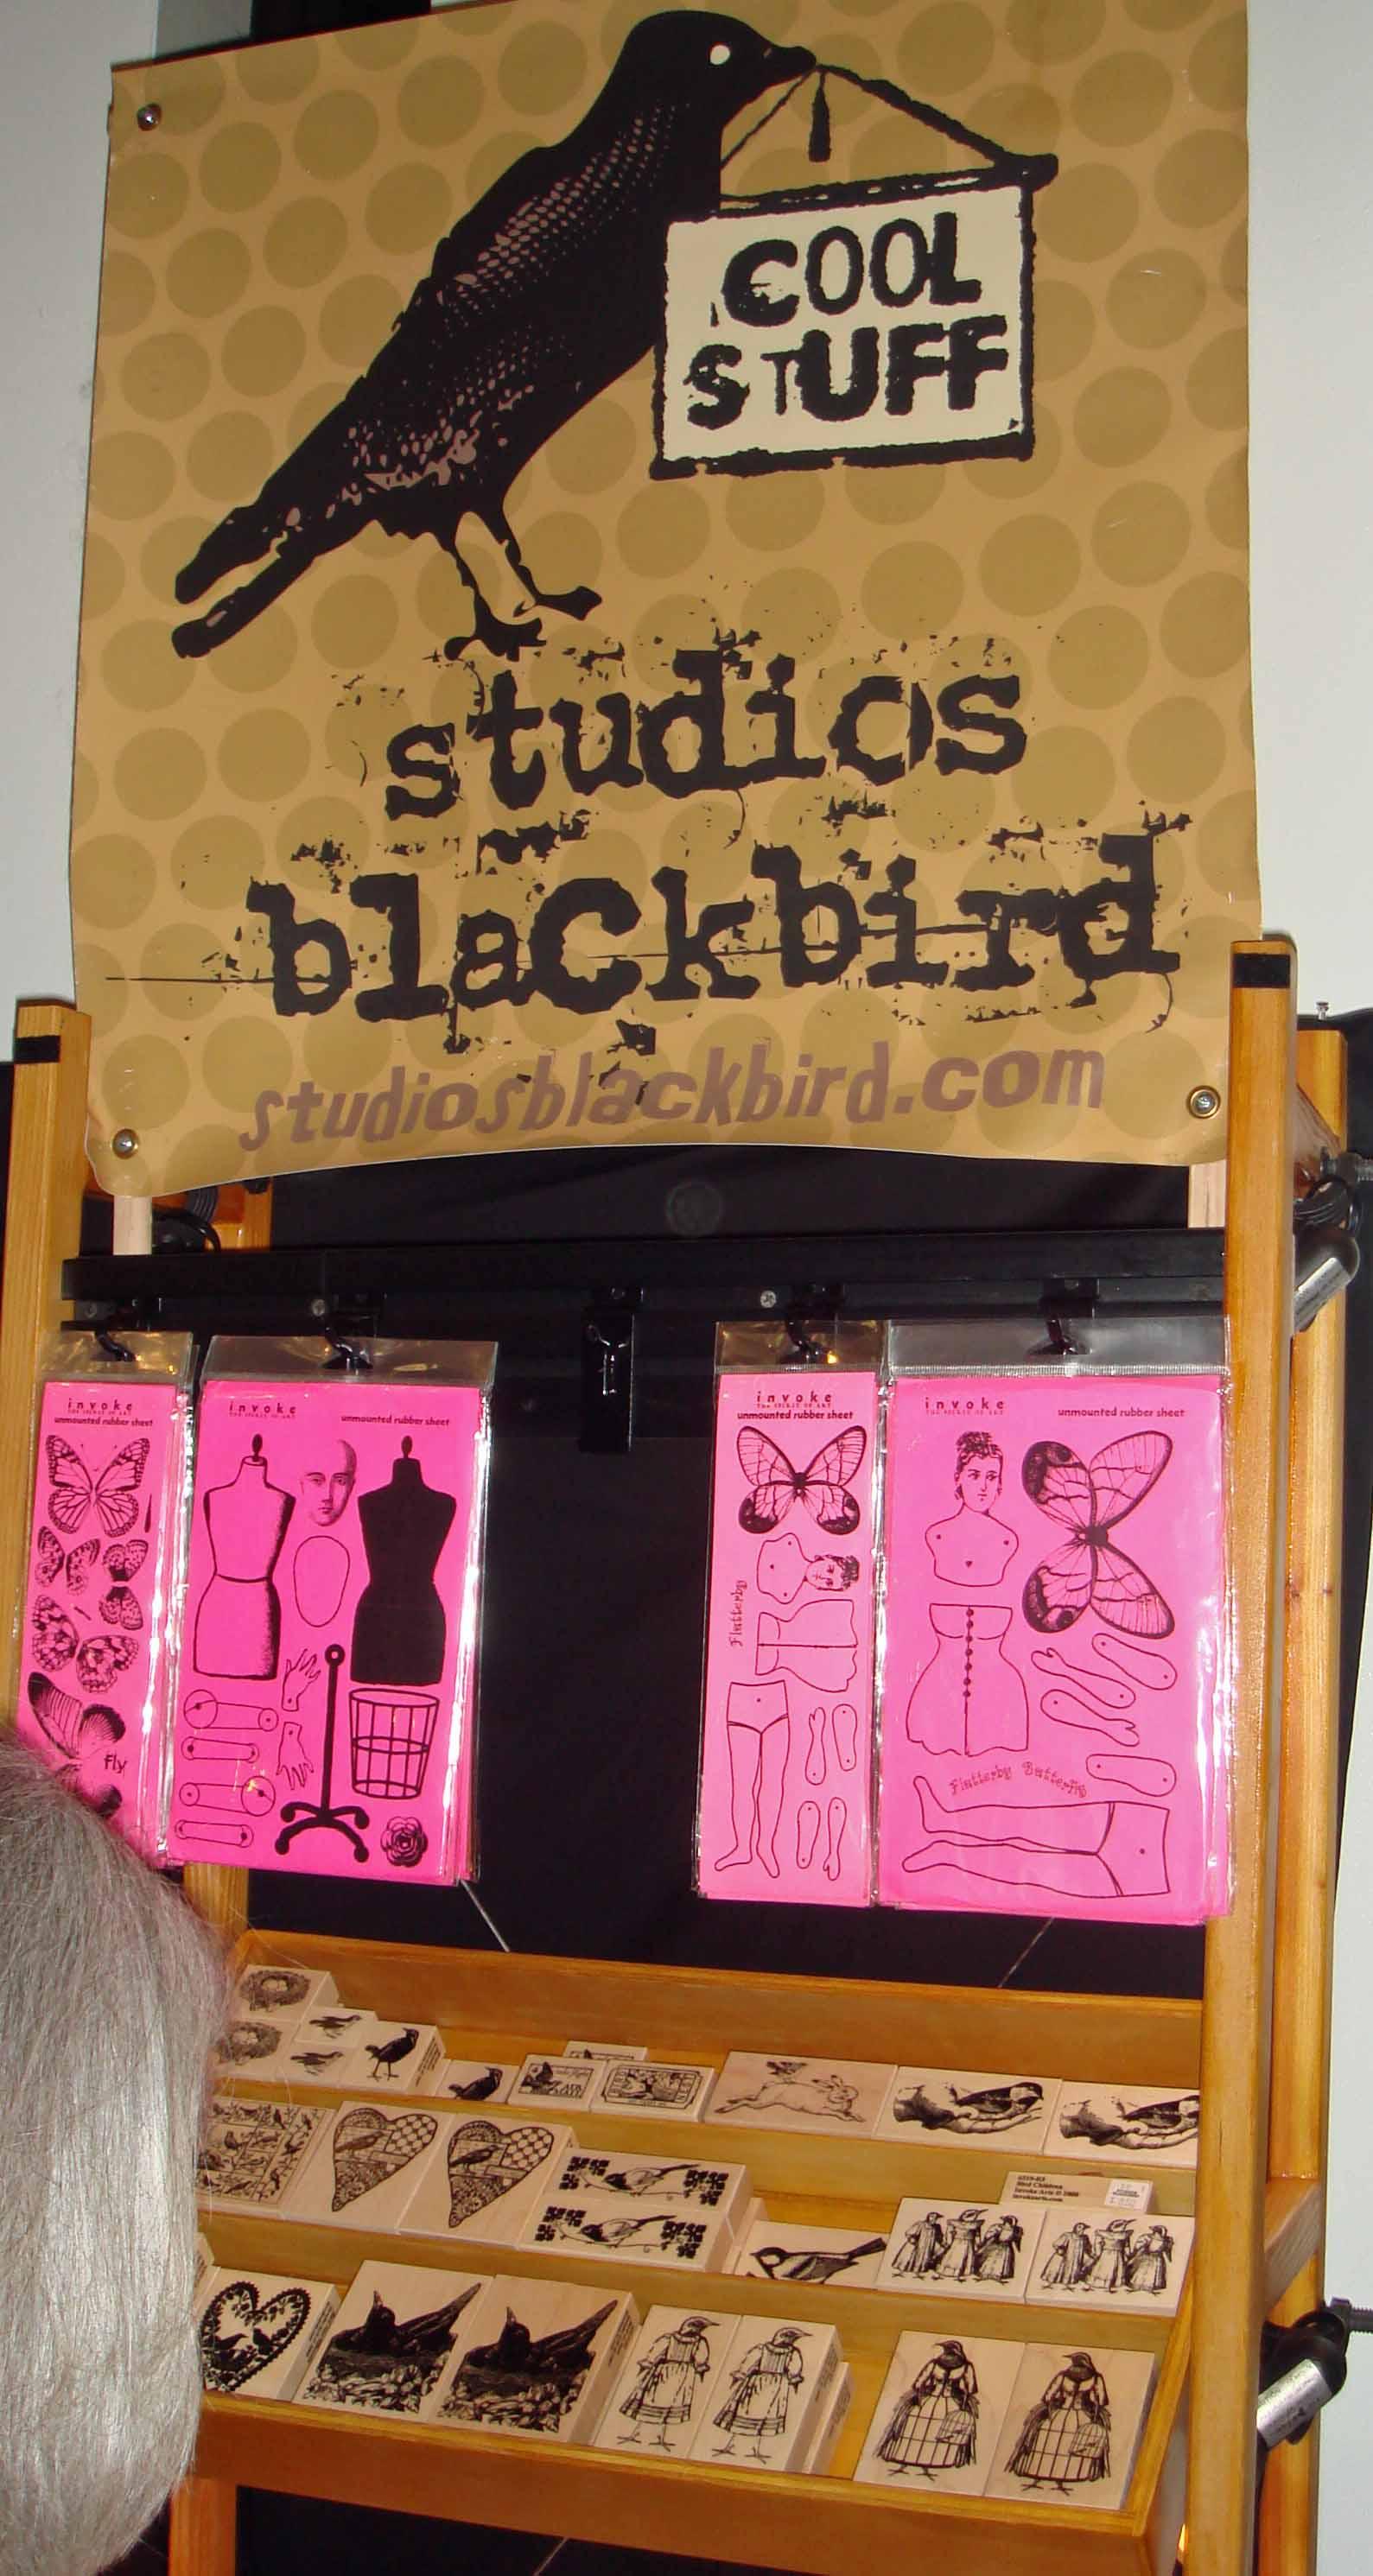 carson studio blackbird sign